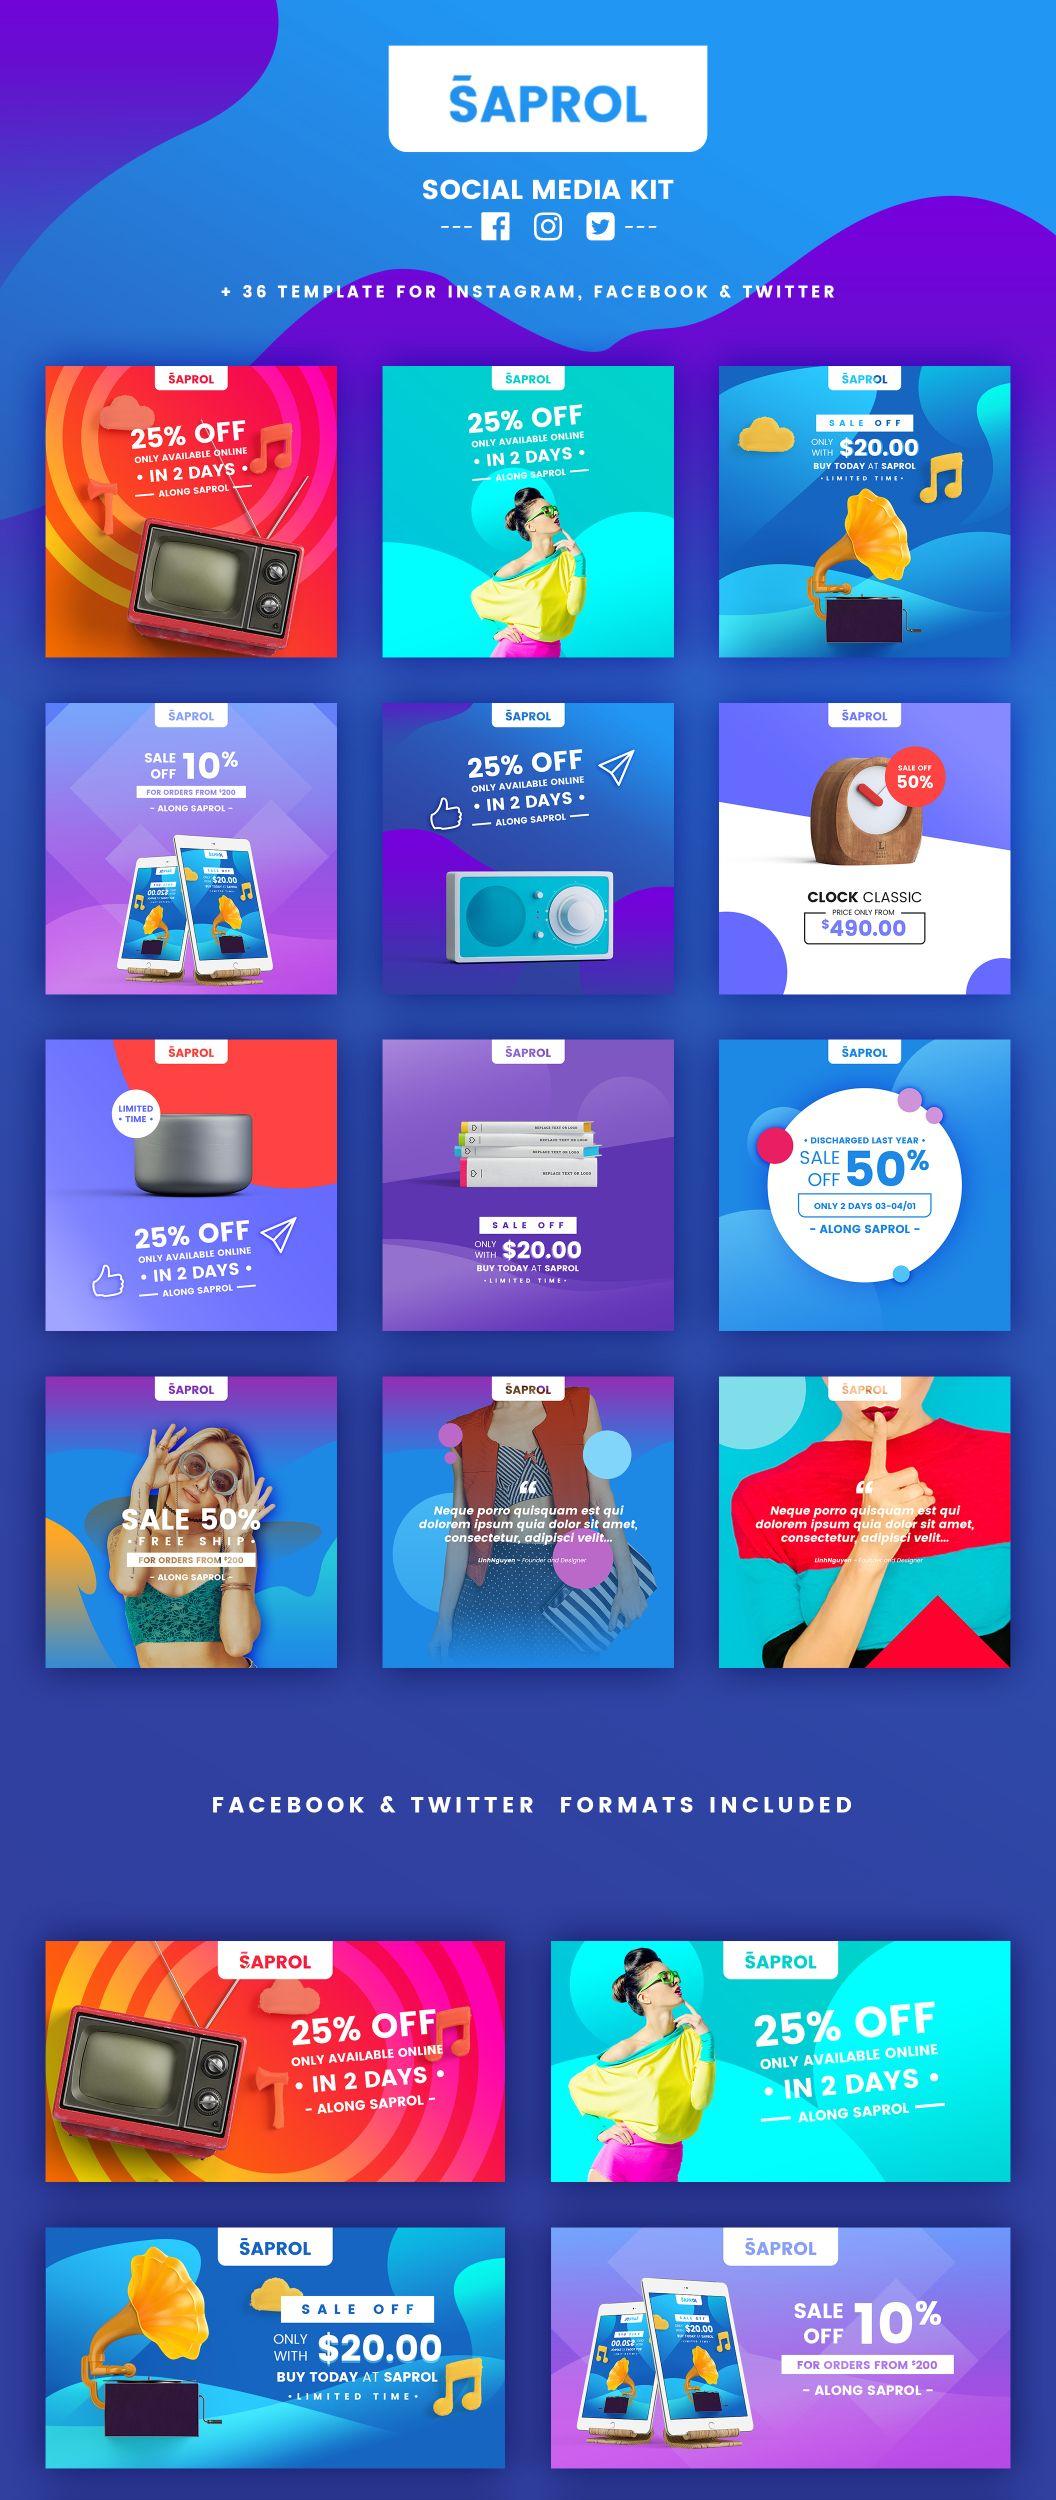 Saprol Social Media Kit A Handy Tool That Would Turn Your Artwork Into Engaging Promo Social Media Design Inspiration Social Media Banner Social Media Branding